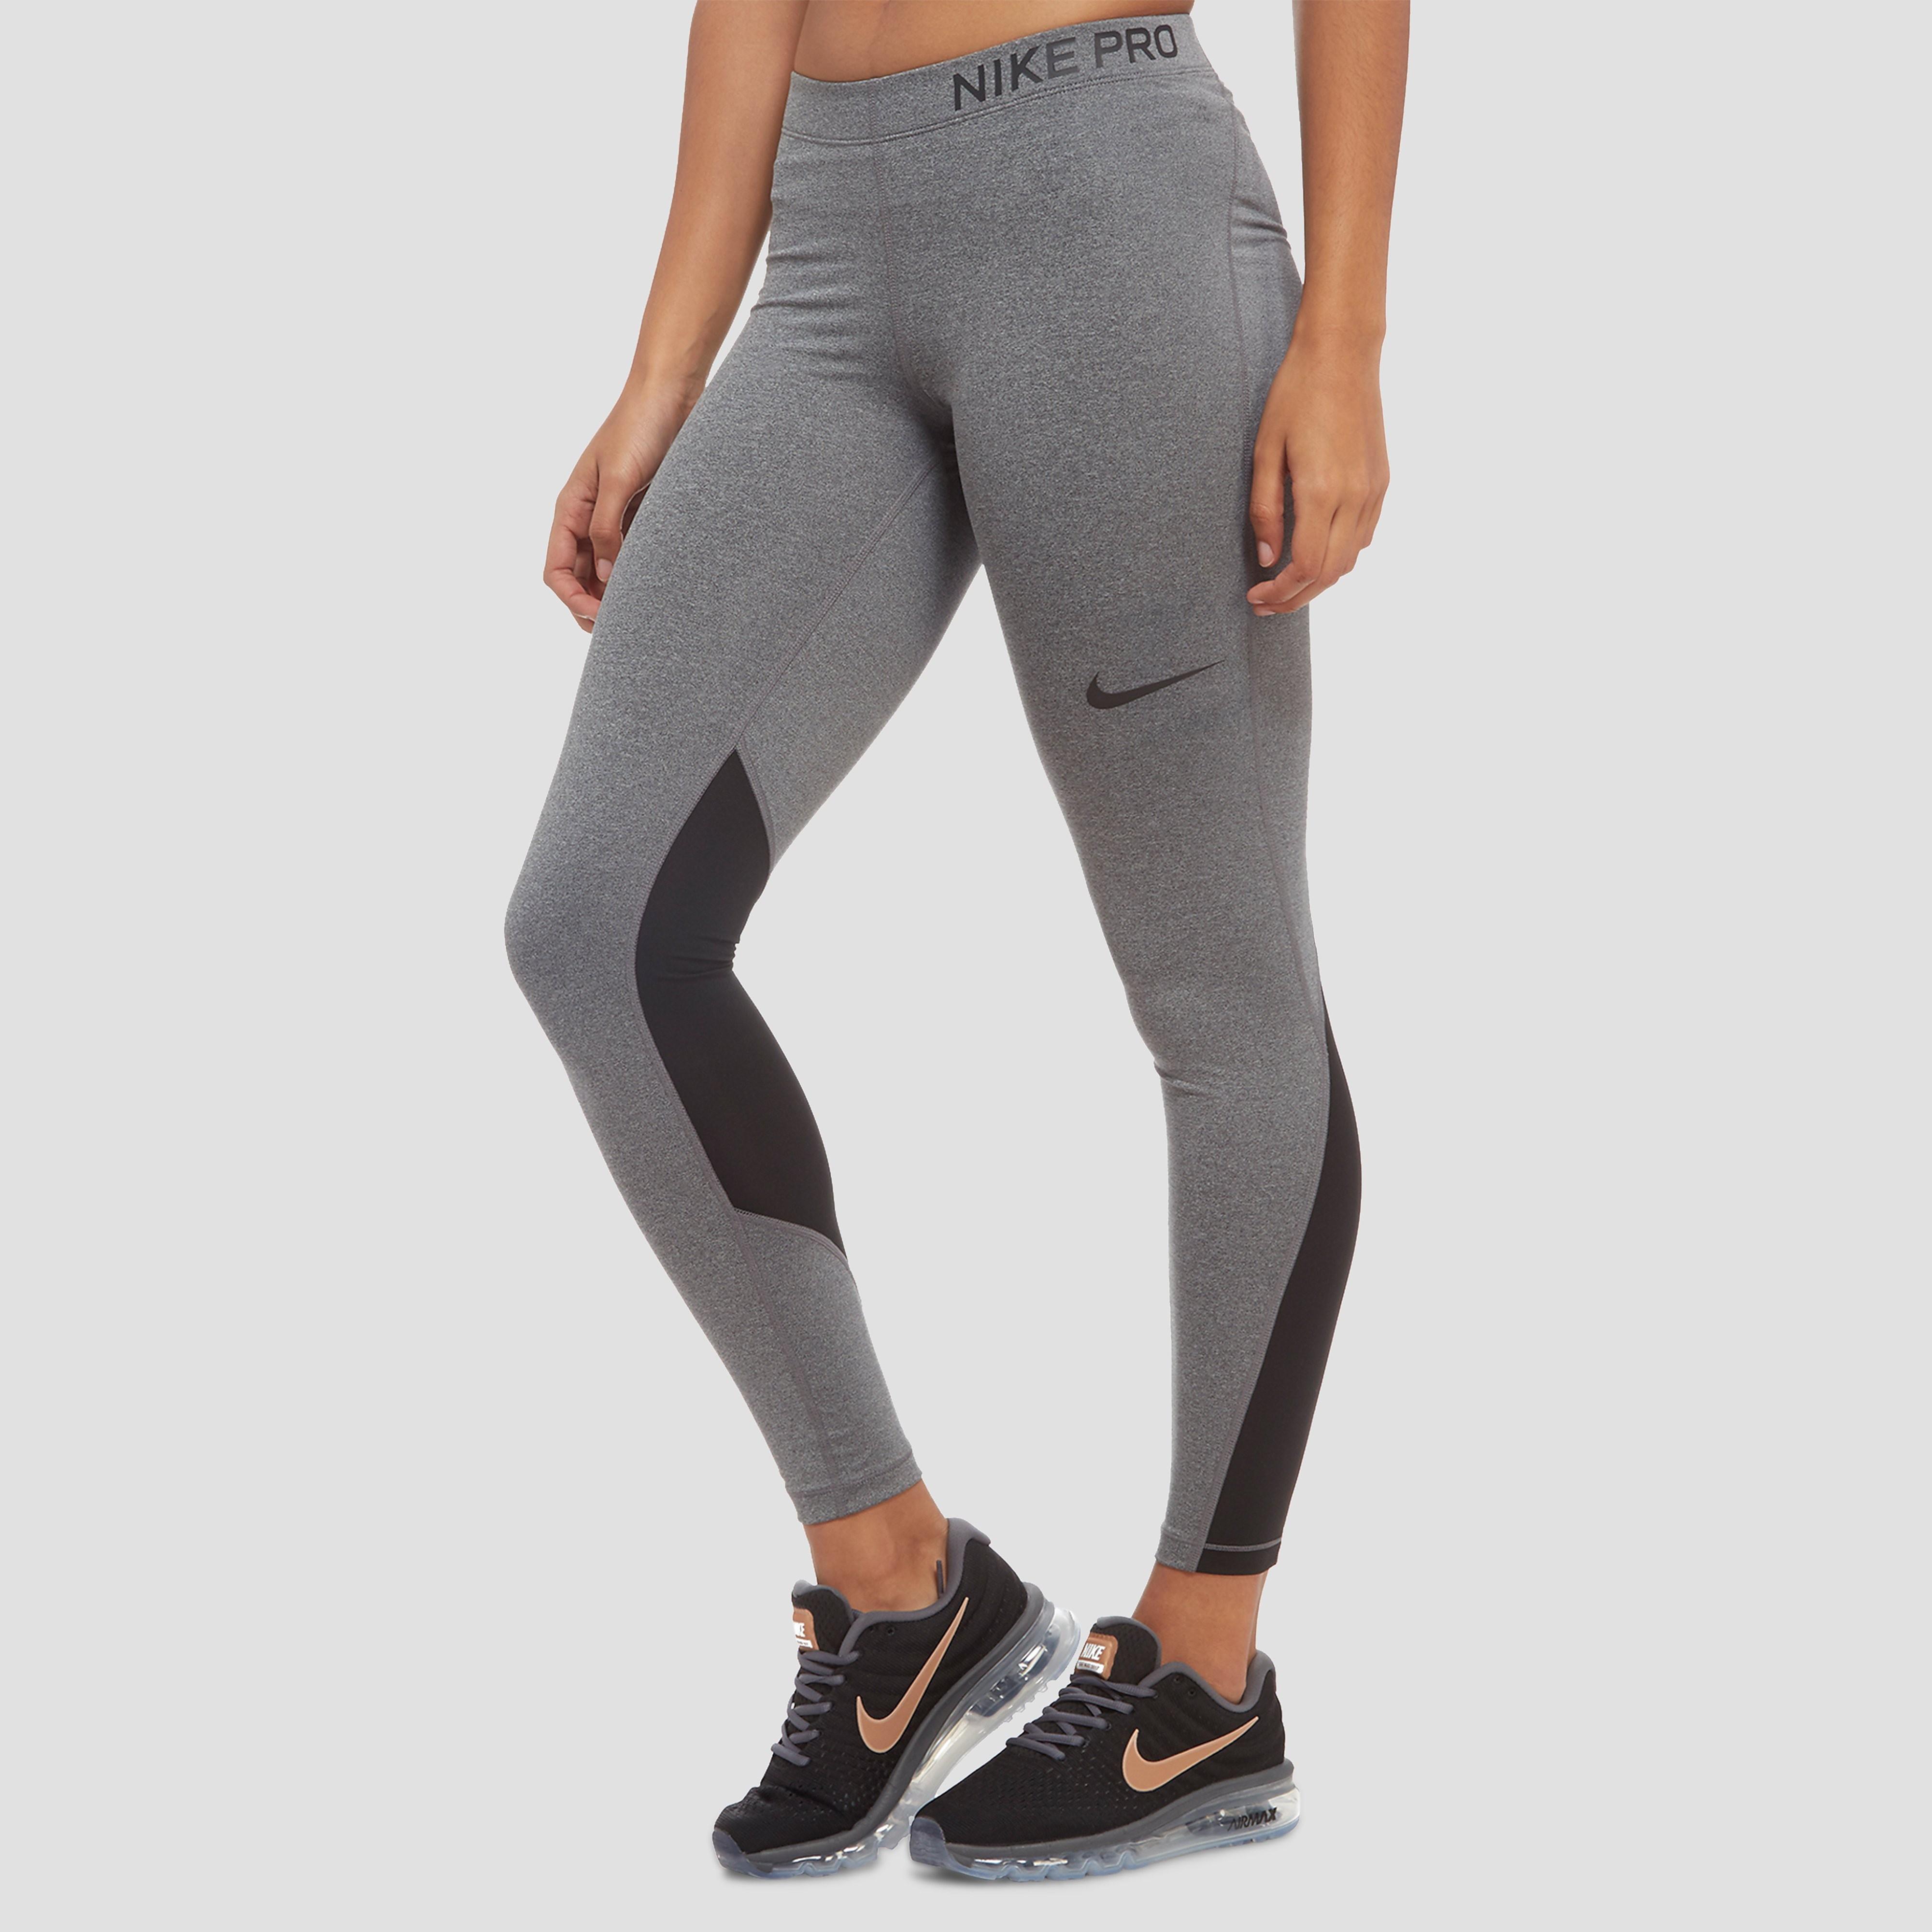 Nike Pro Women's Leggings